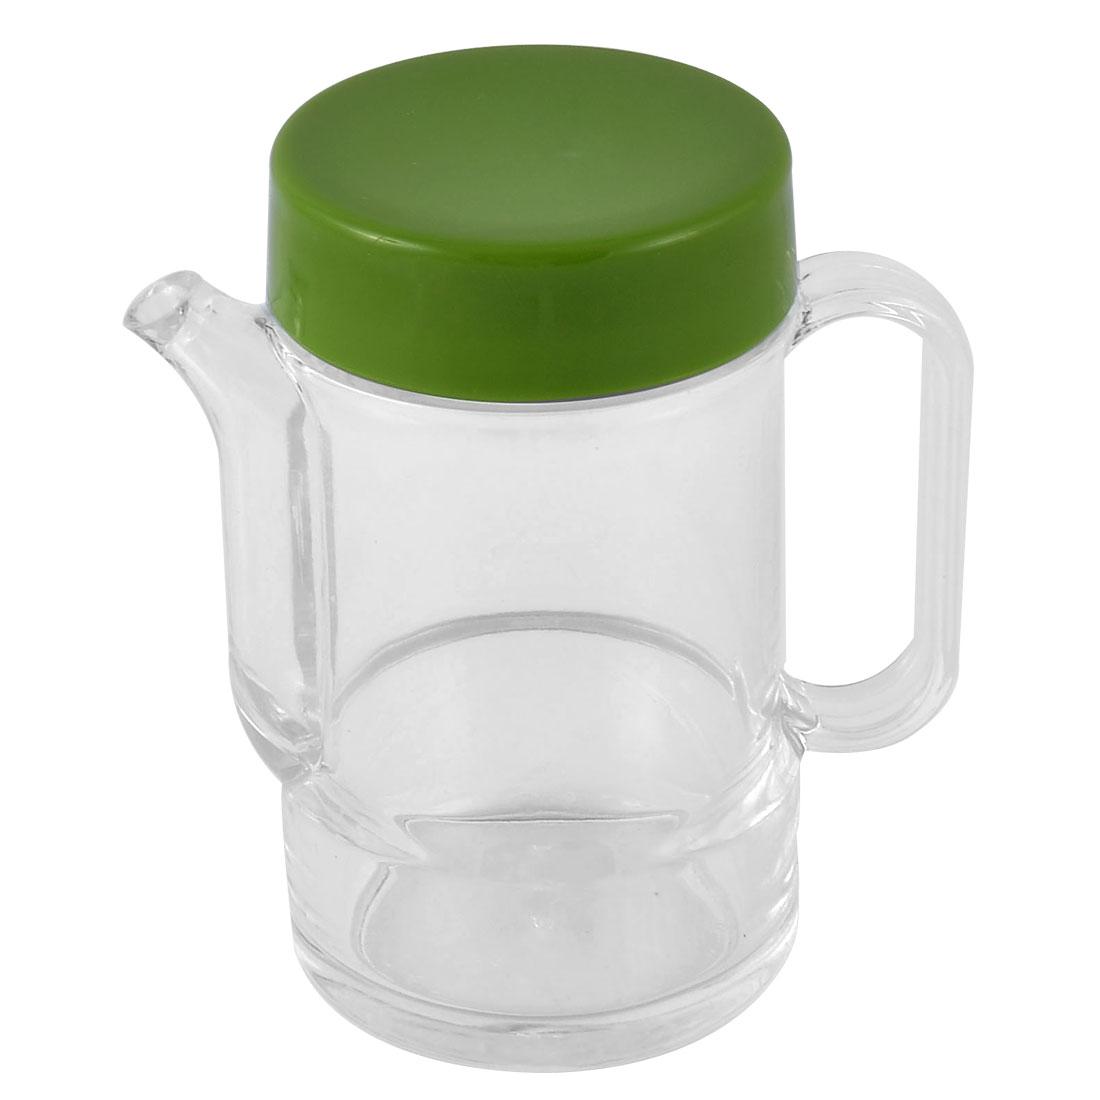 Plastic Household Kitchen Cooking Oil Sauce Cruet Green 300ml Capacity